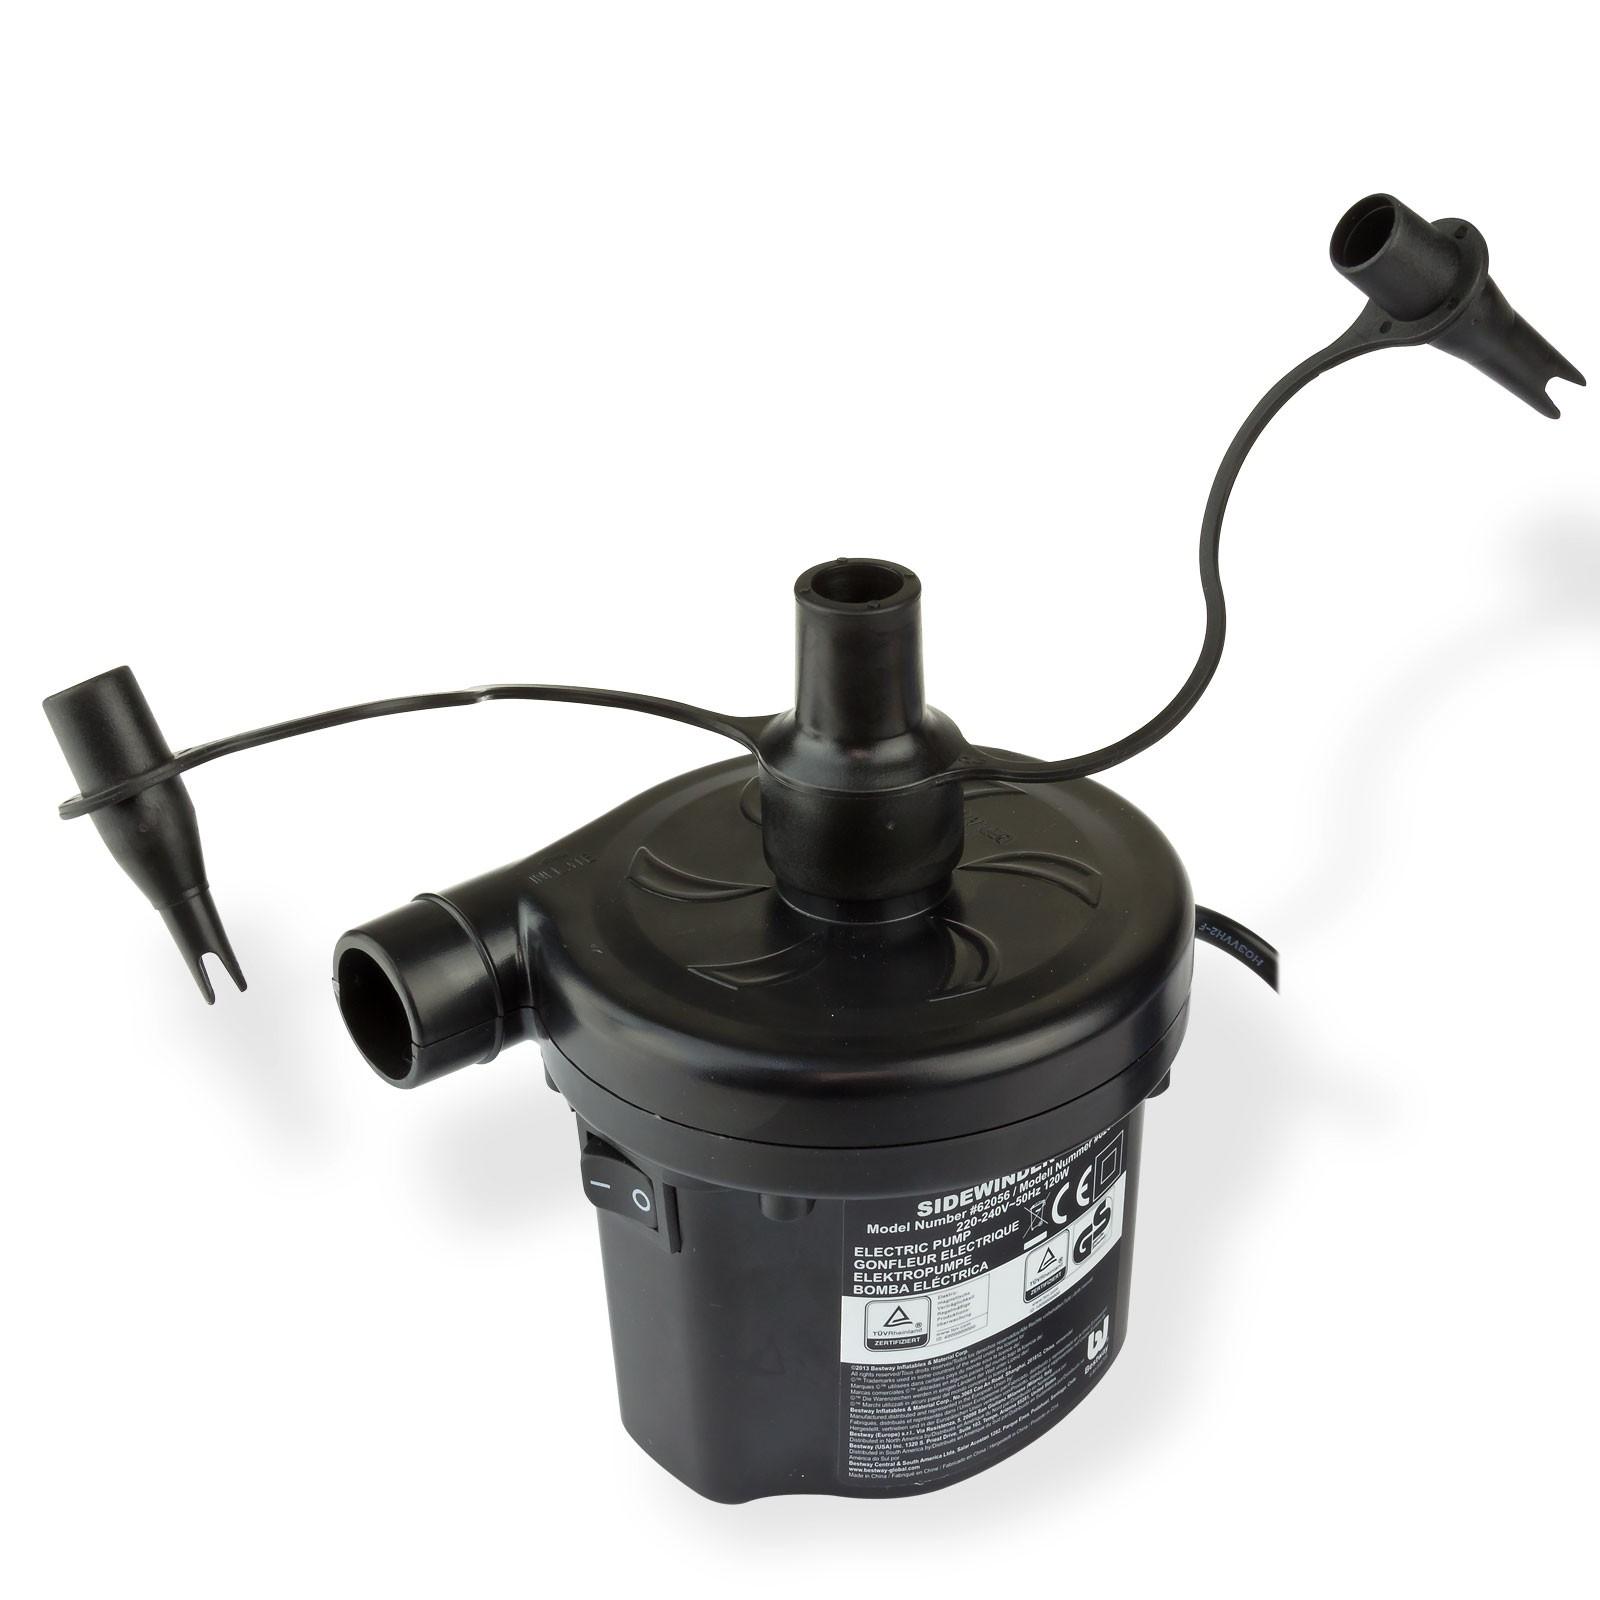 universal luftpumpe elektrisch 230 v elektropumpe gebl sepumpe standluftpumpe 6942138917949 ebay. Black Bedroom Furniture Sets. Home Design Ideas